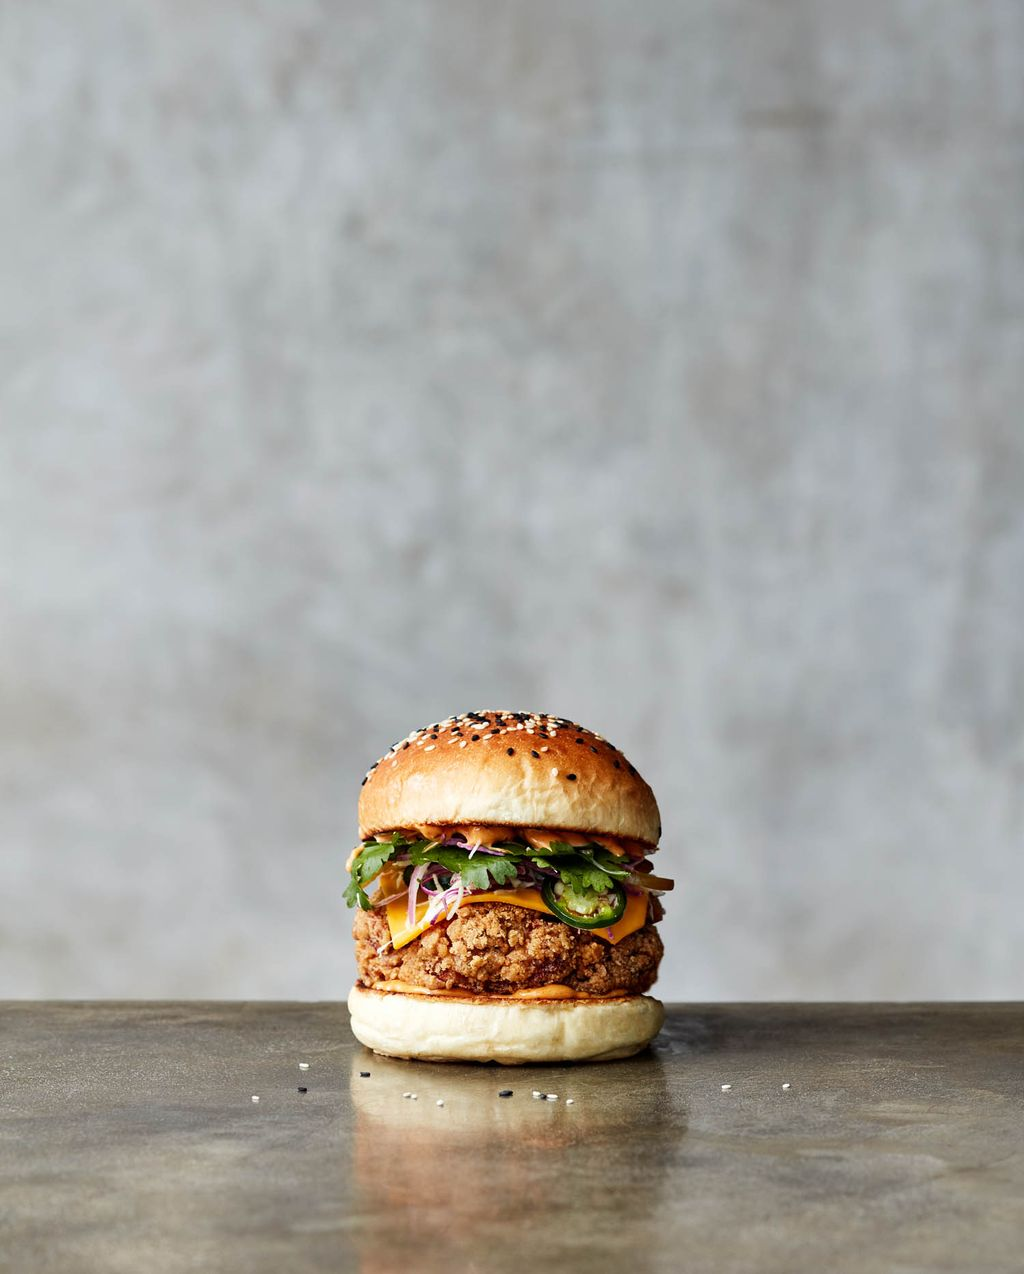 Gurih Juicy Burger Al Capone dan Chook Knight dari Bali Ada di Sini